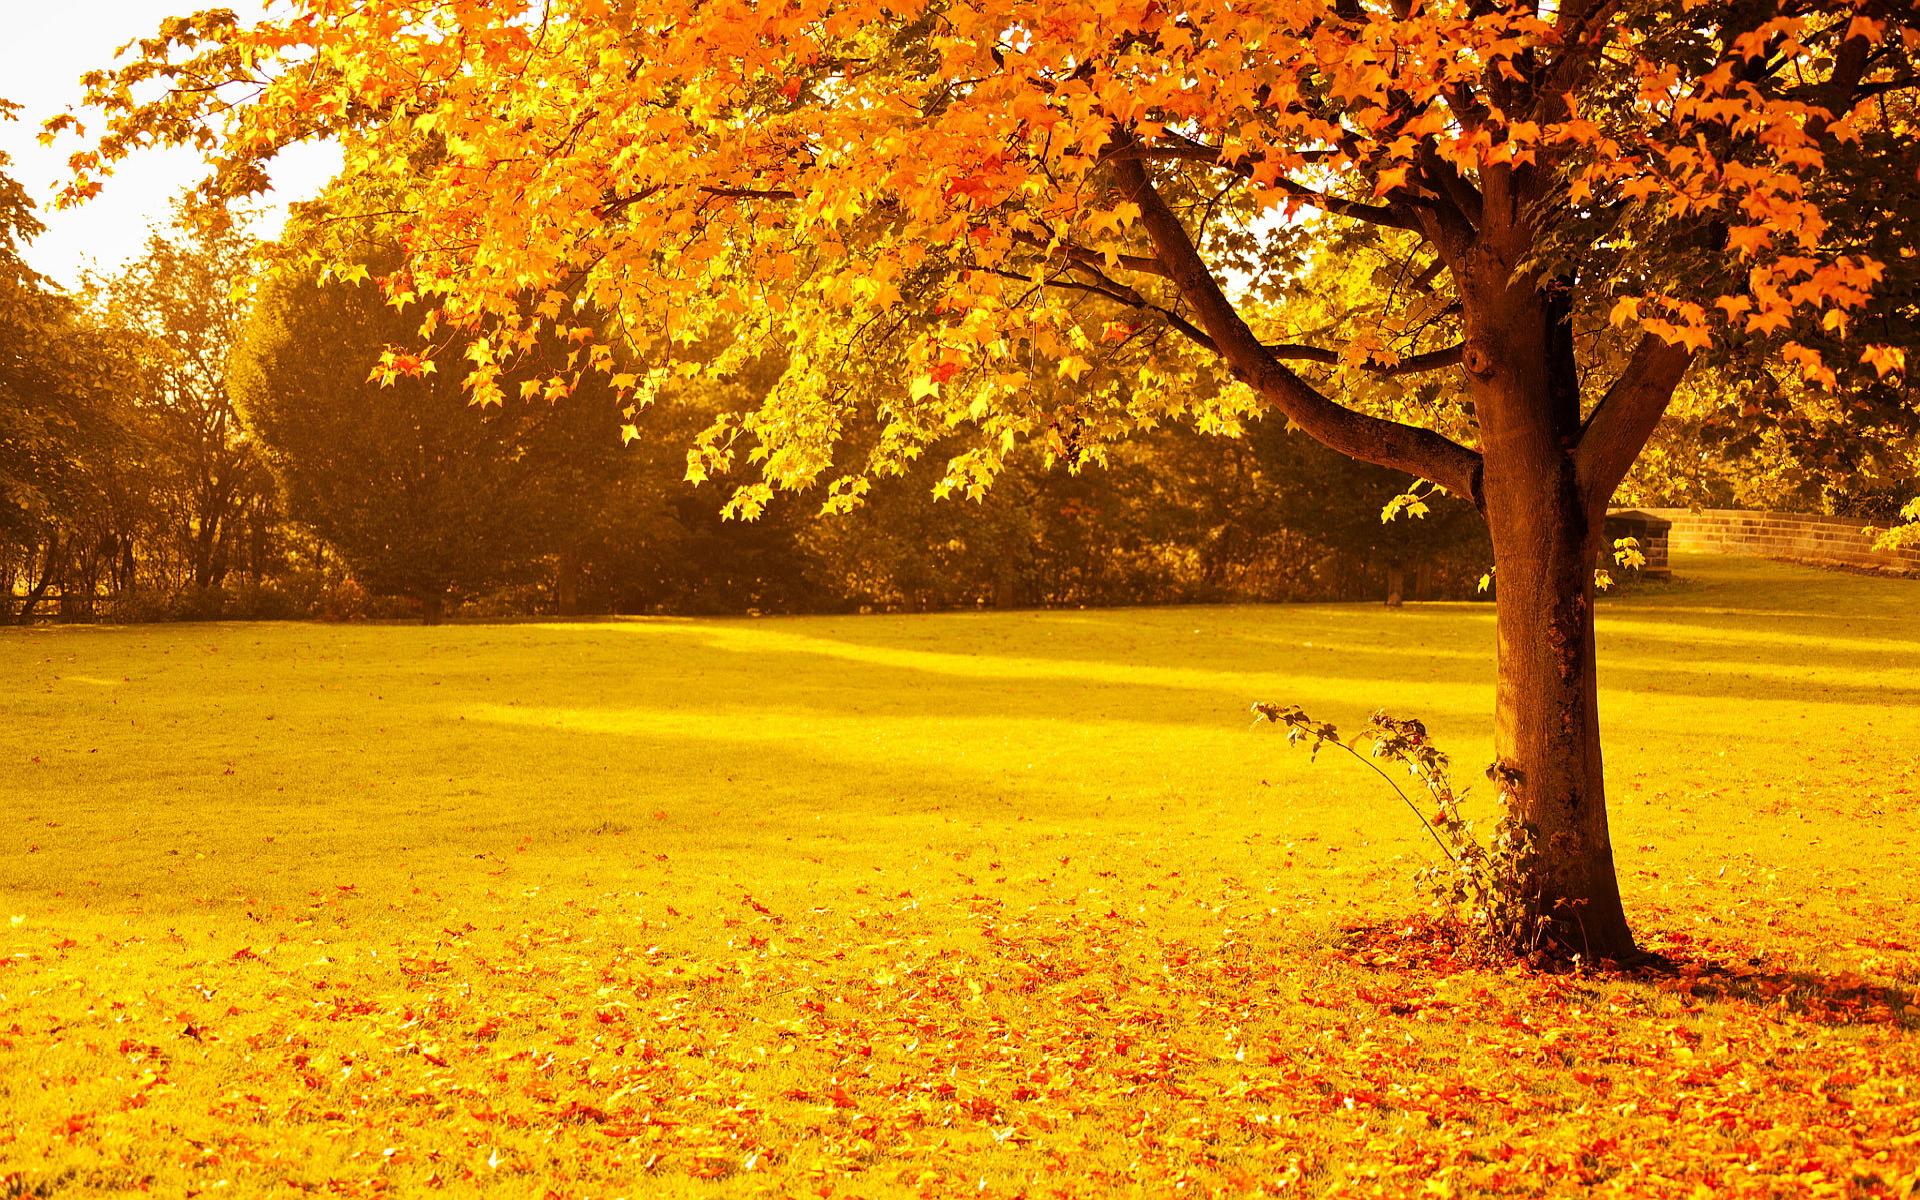 yellowish red park autumn